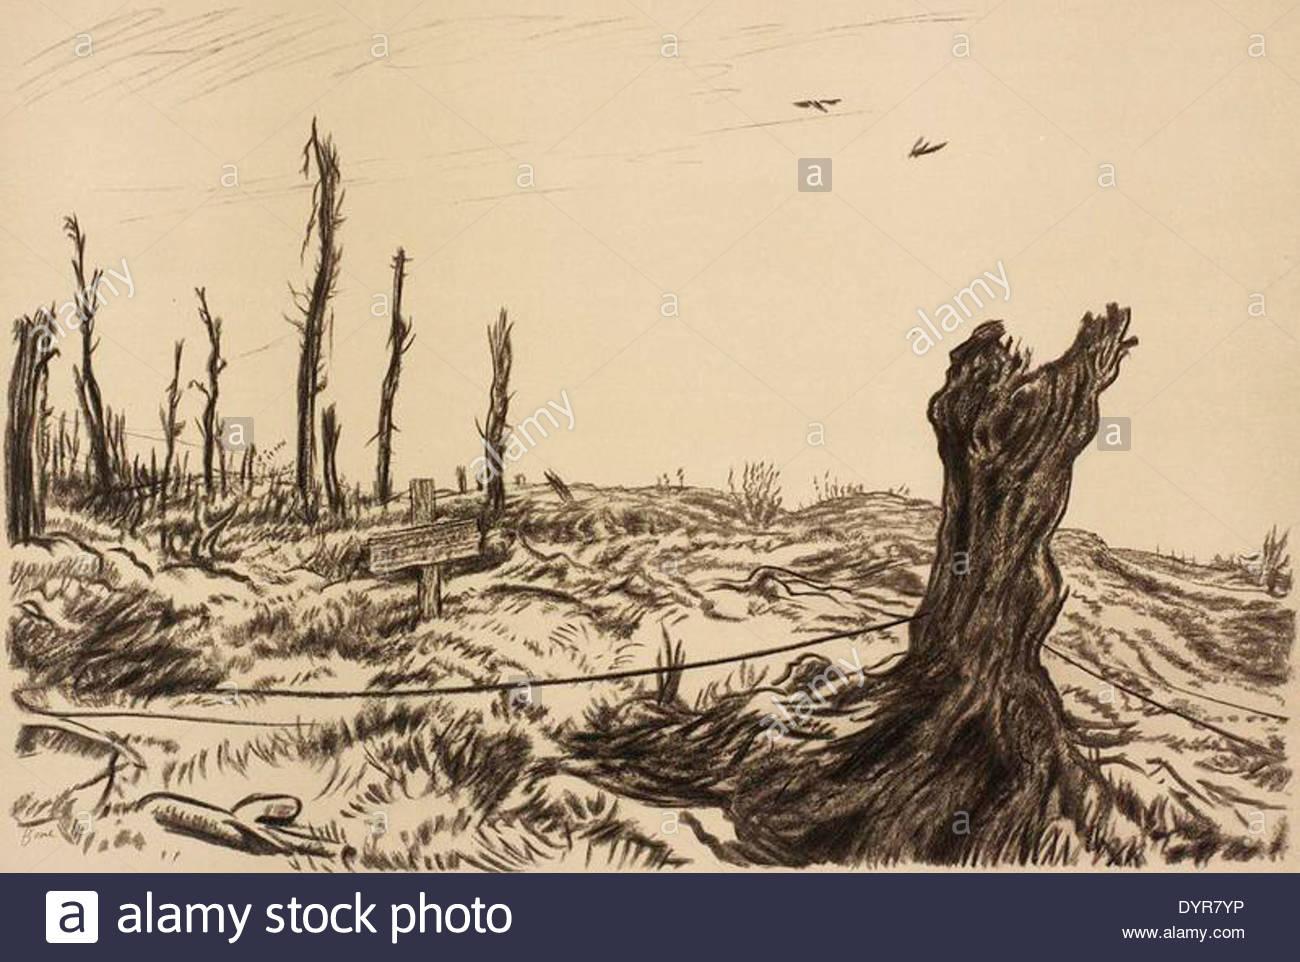 1278 War Drawings by Muirhead Bone-'inconnu' Art.IWMREPRO00068460